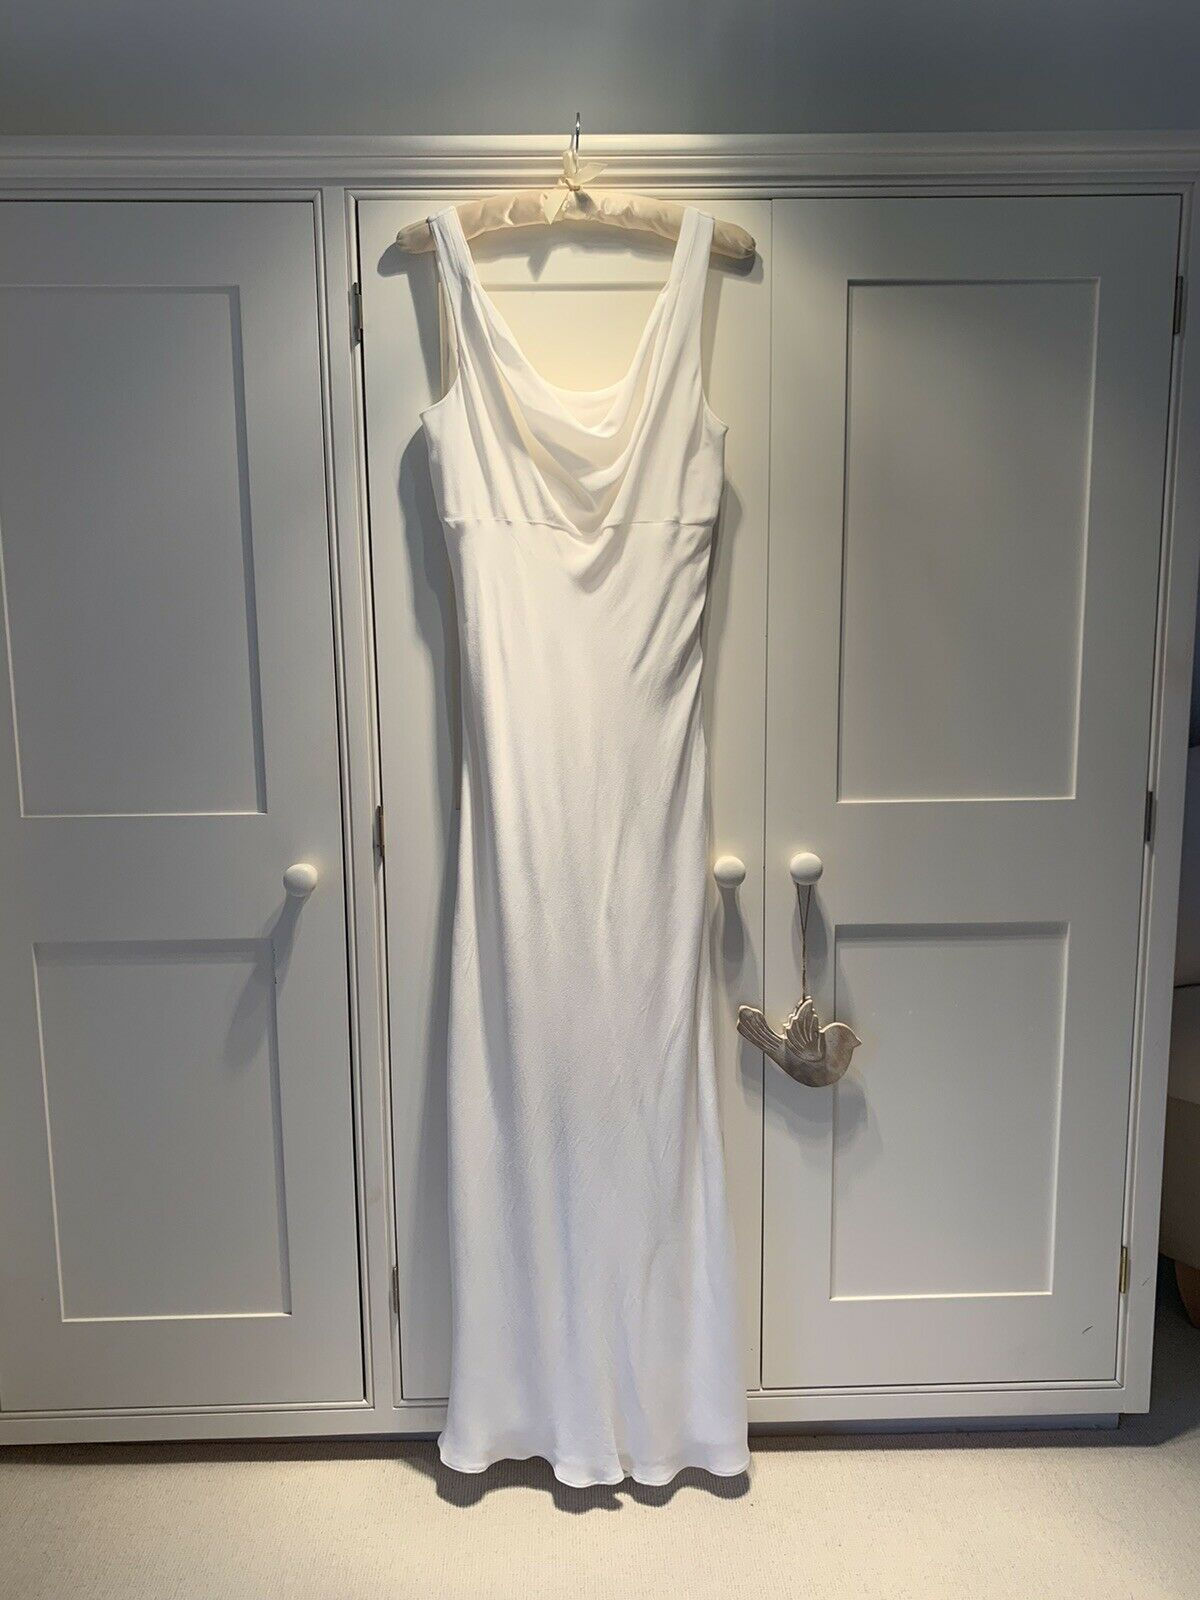 Wallis Long Ivory Dress - Size 12 - Bridesmaid Or Evening